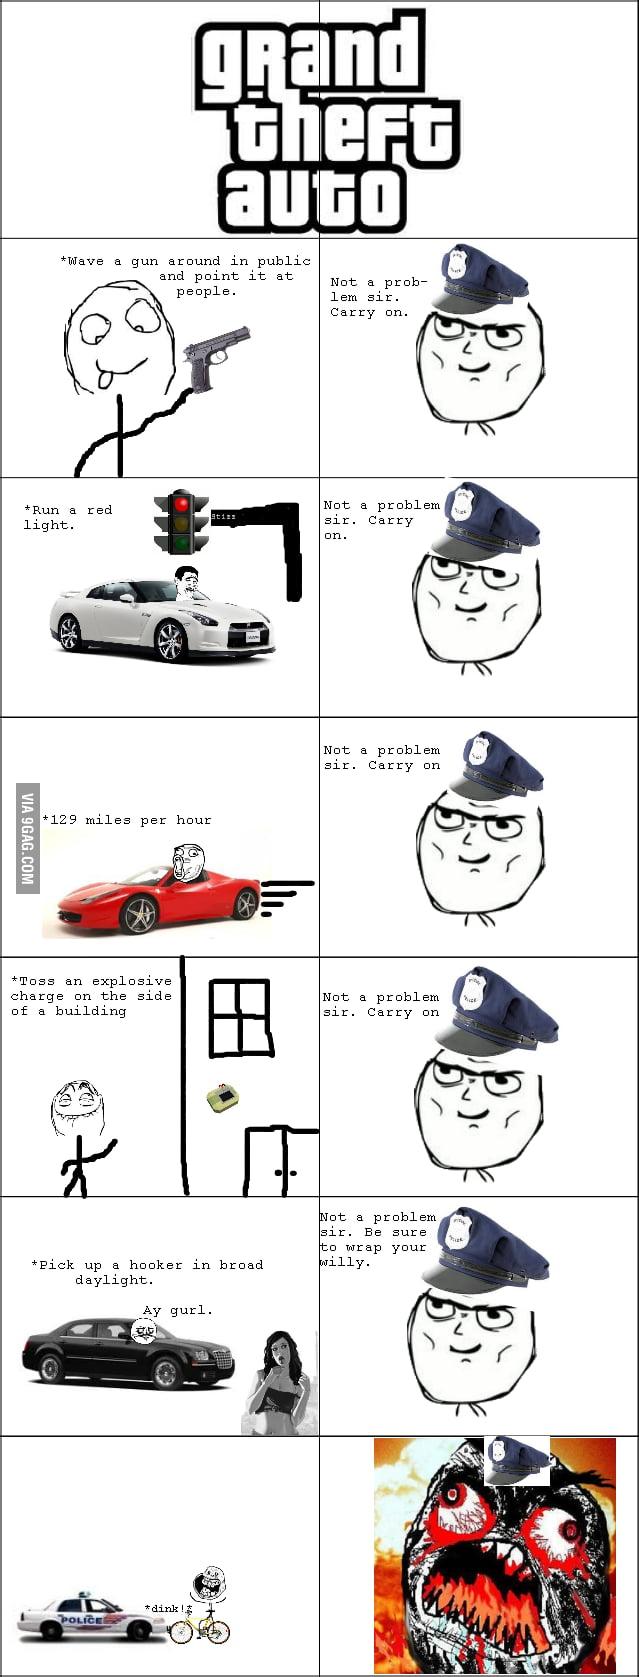 Grand Theft Auto logic...